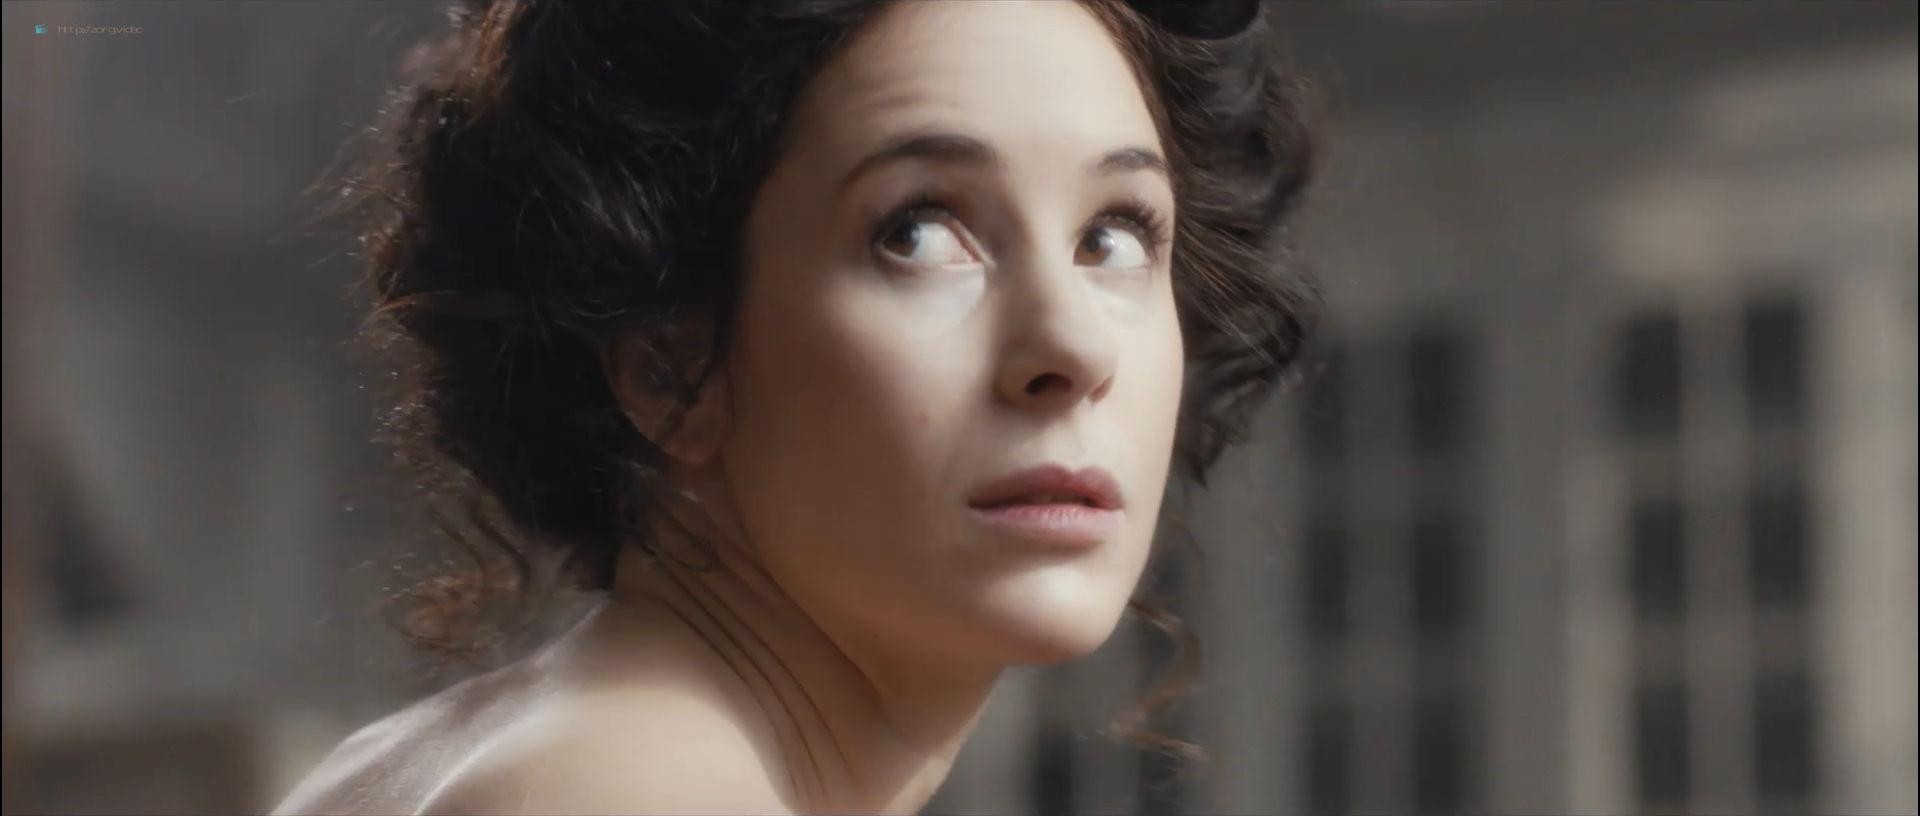 Anastasiya Meskova nude full frontal Olga Sutulova nude sex - Trotsky (2017) s1e1-2 HD 1080p (9)